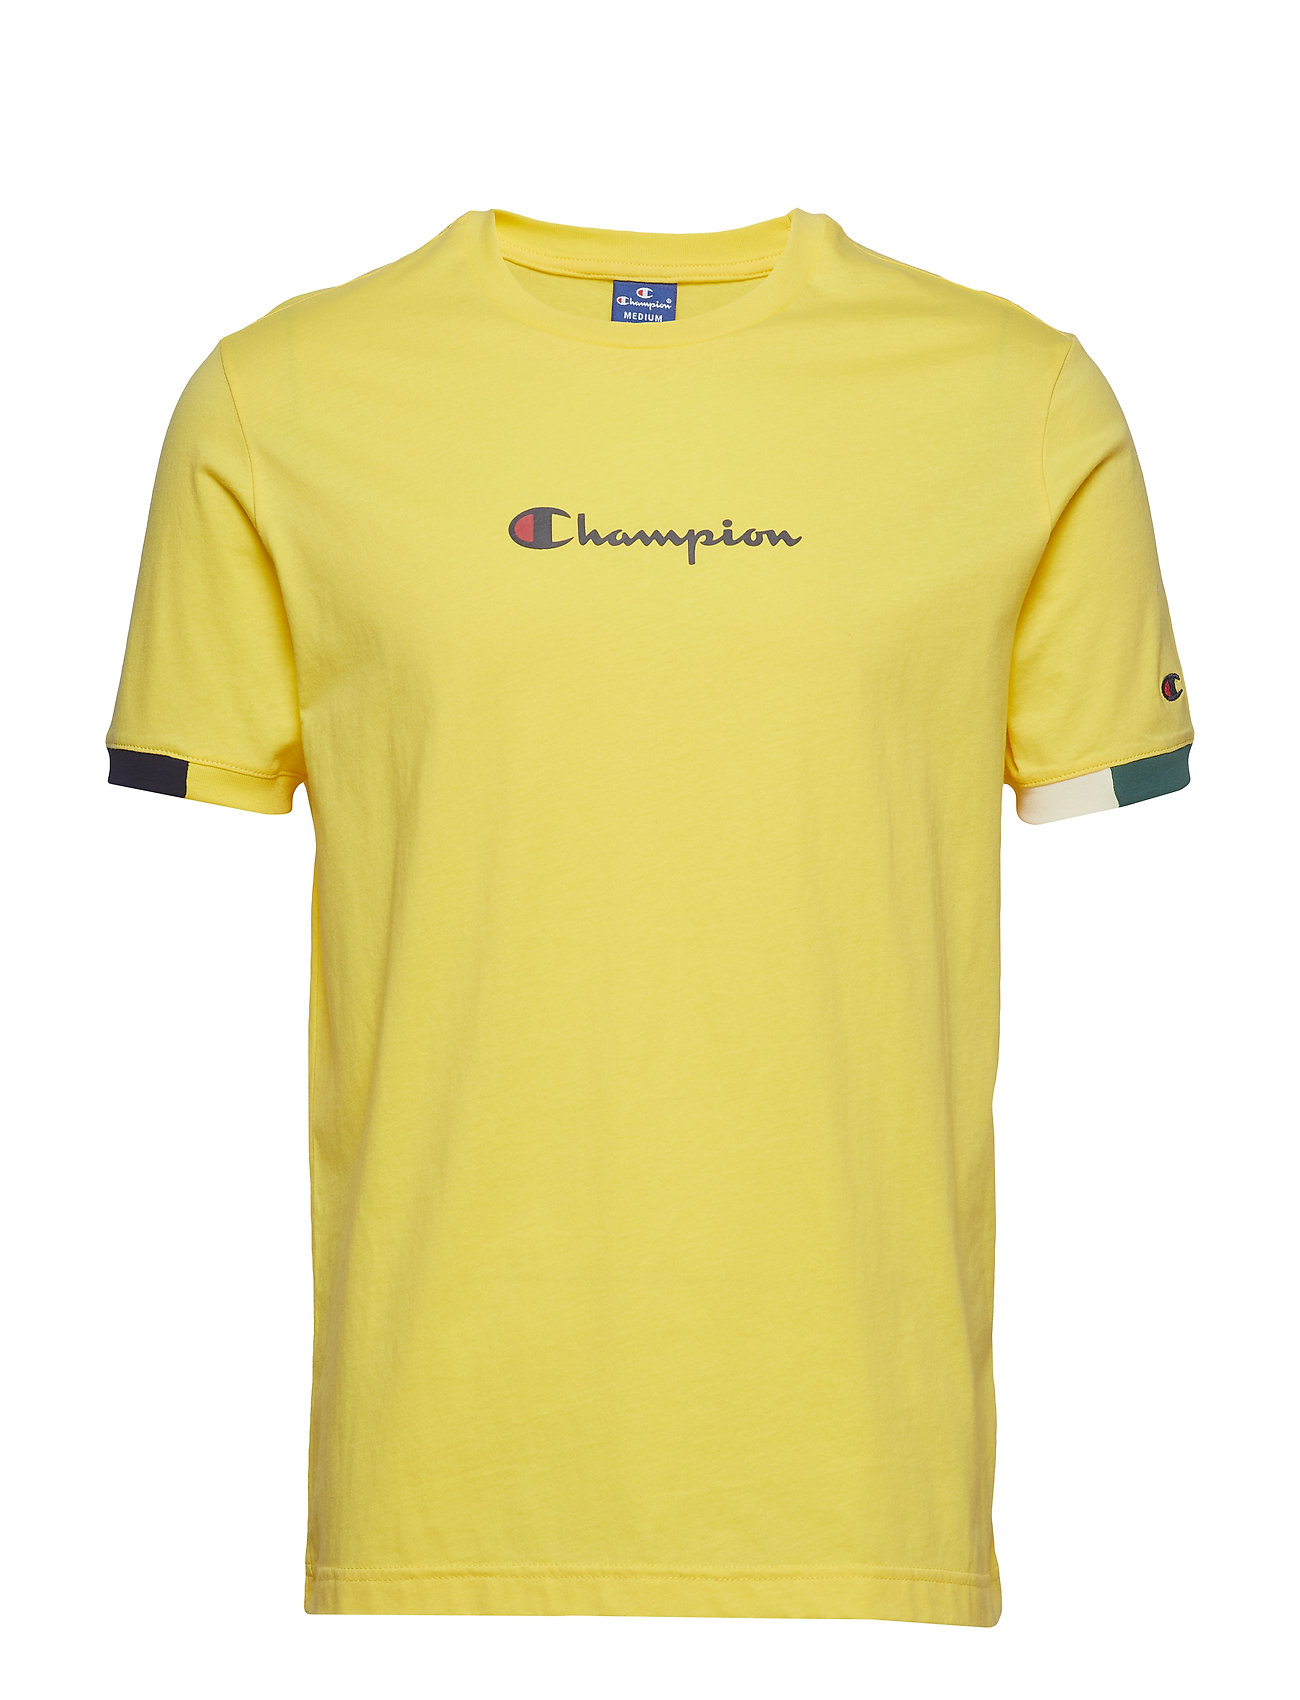 Ringer T Shirt T shirt Gul CHAMPION ROCHESTER